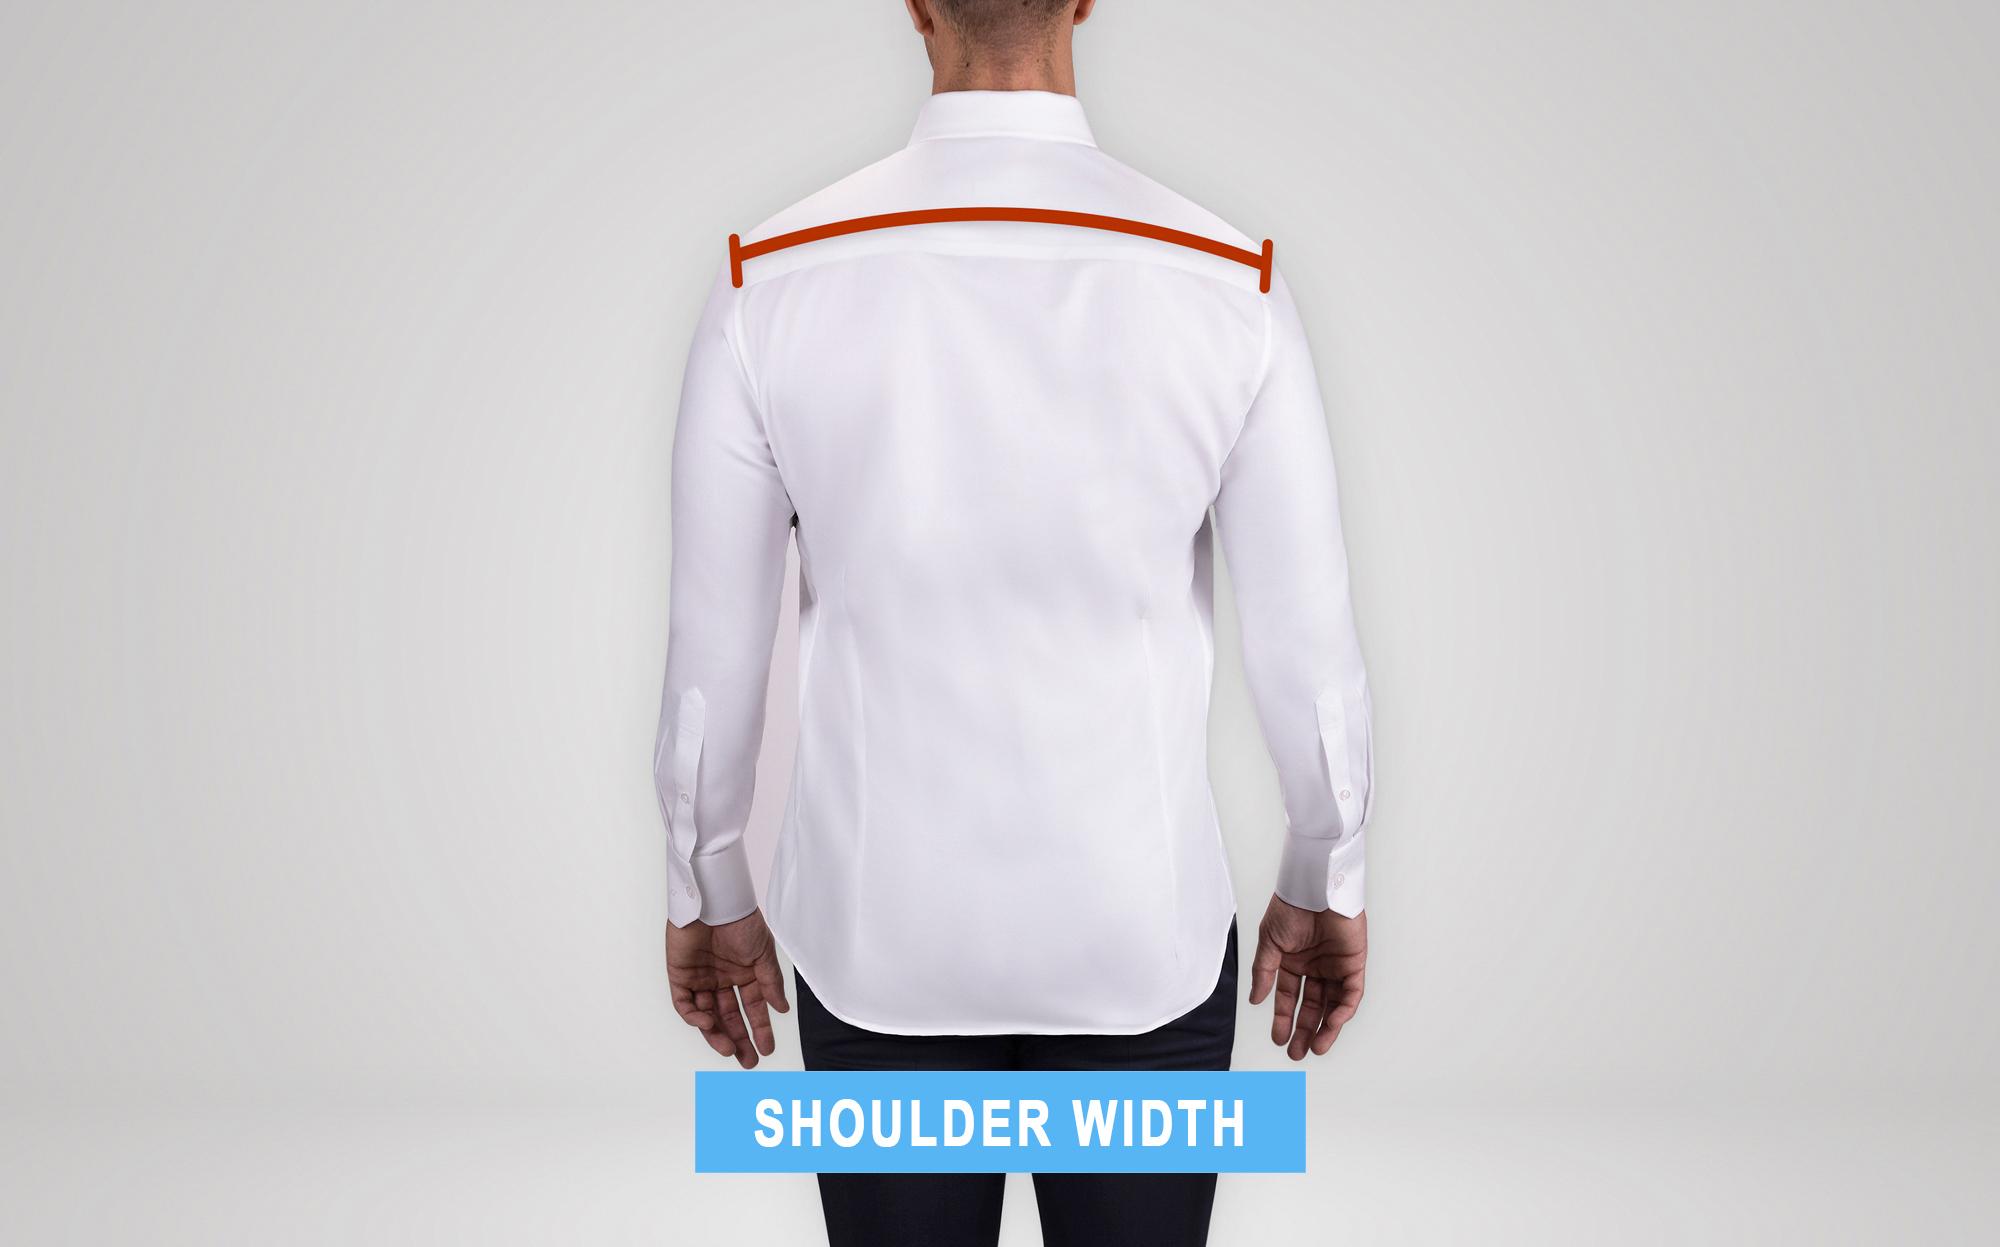 how to measure suit's shoulder width